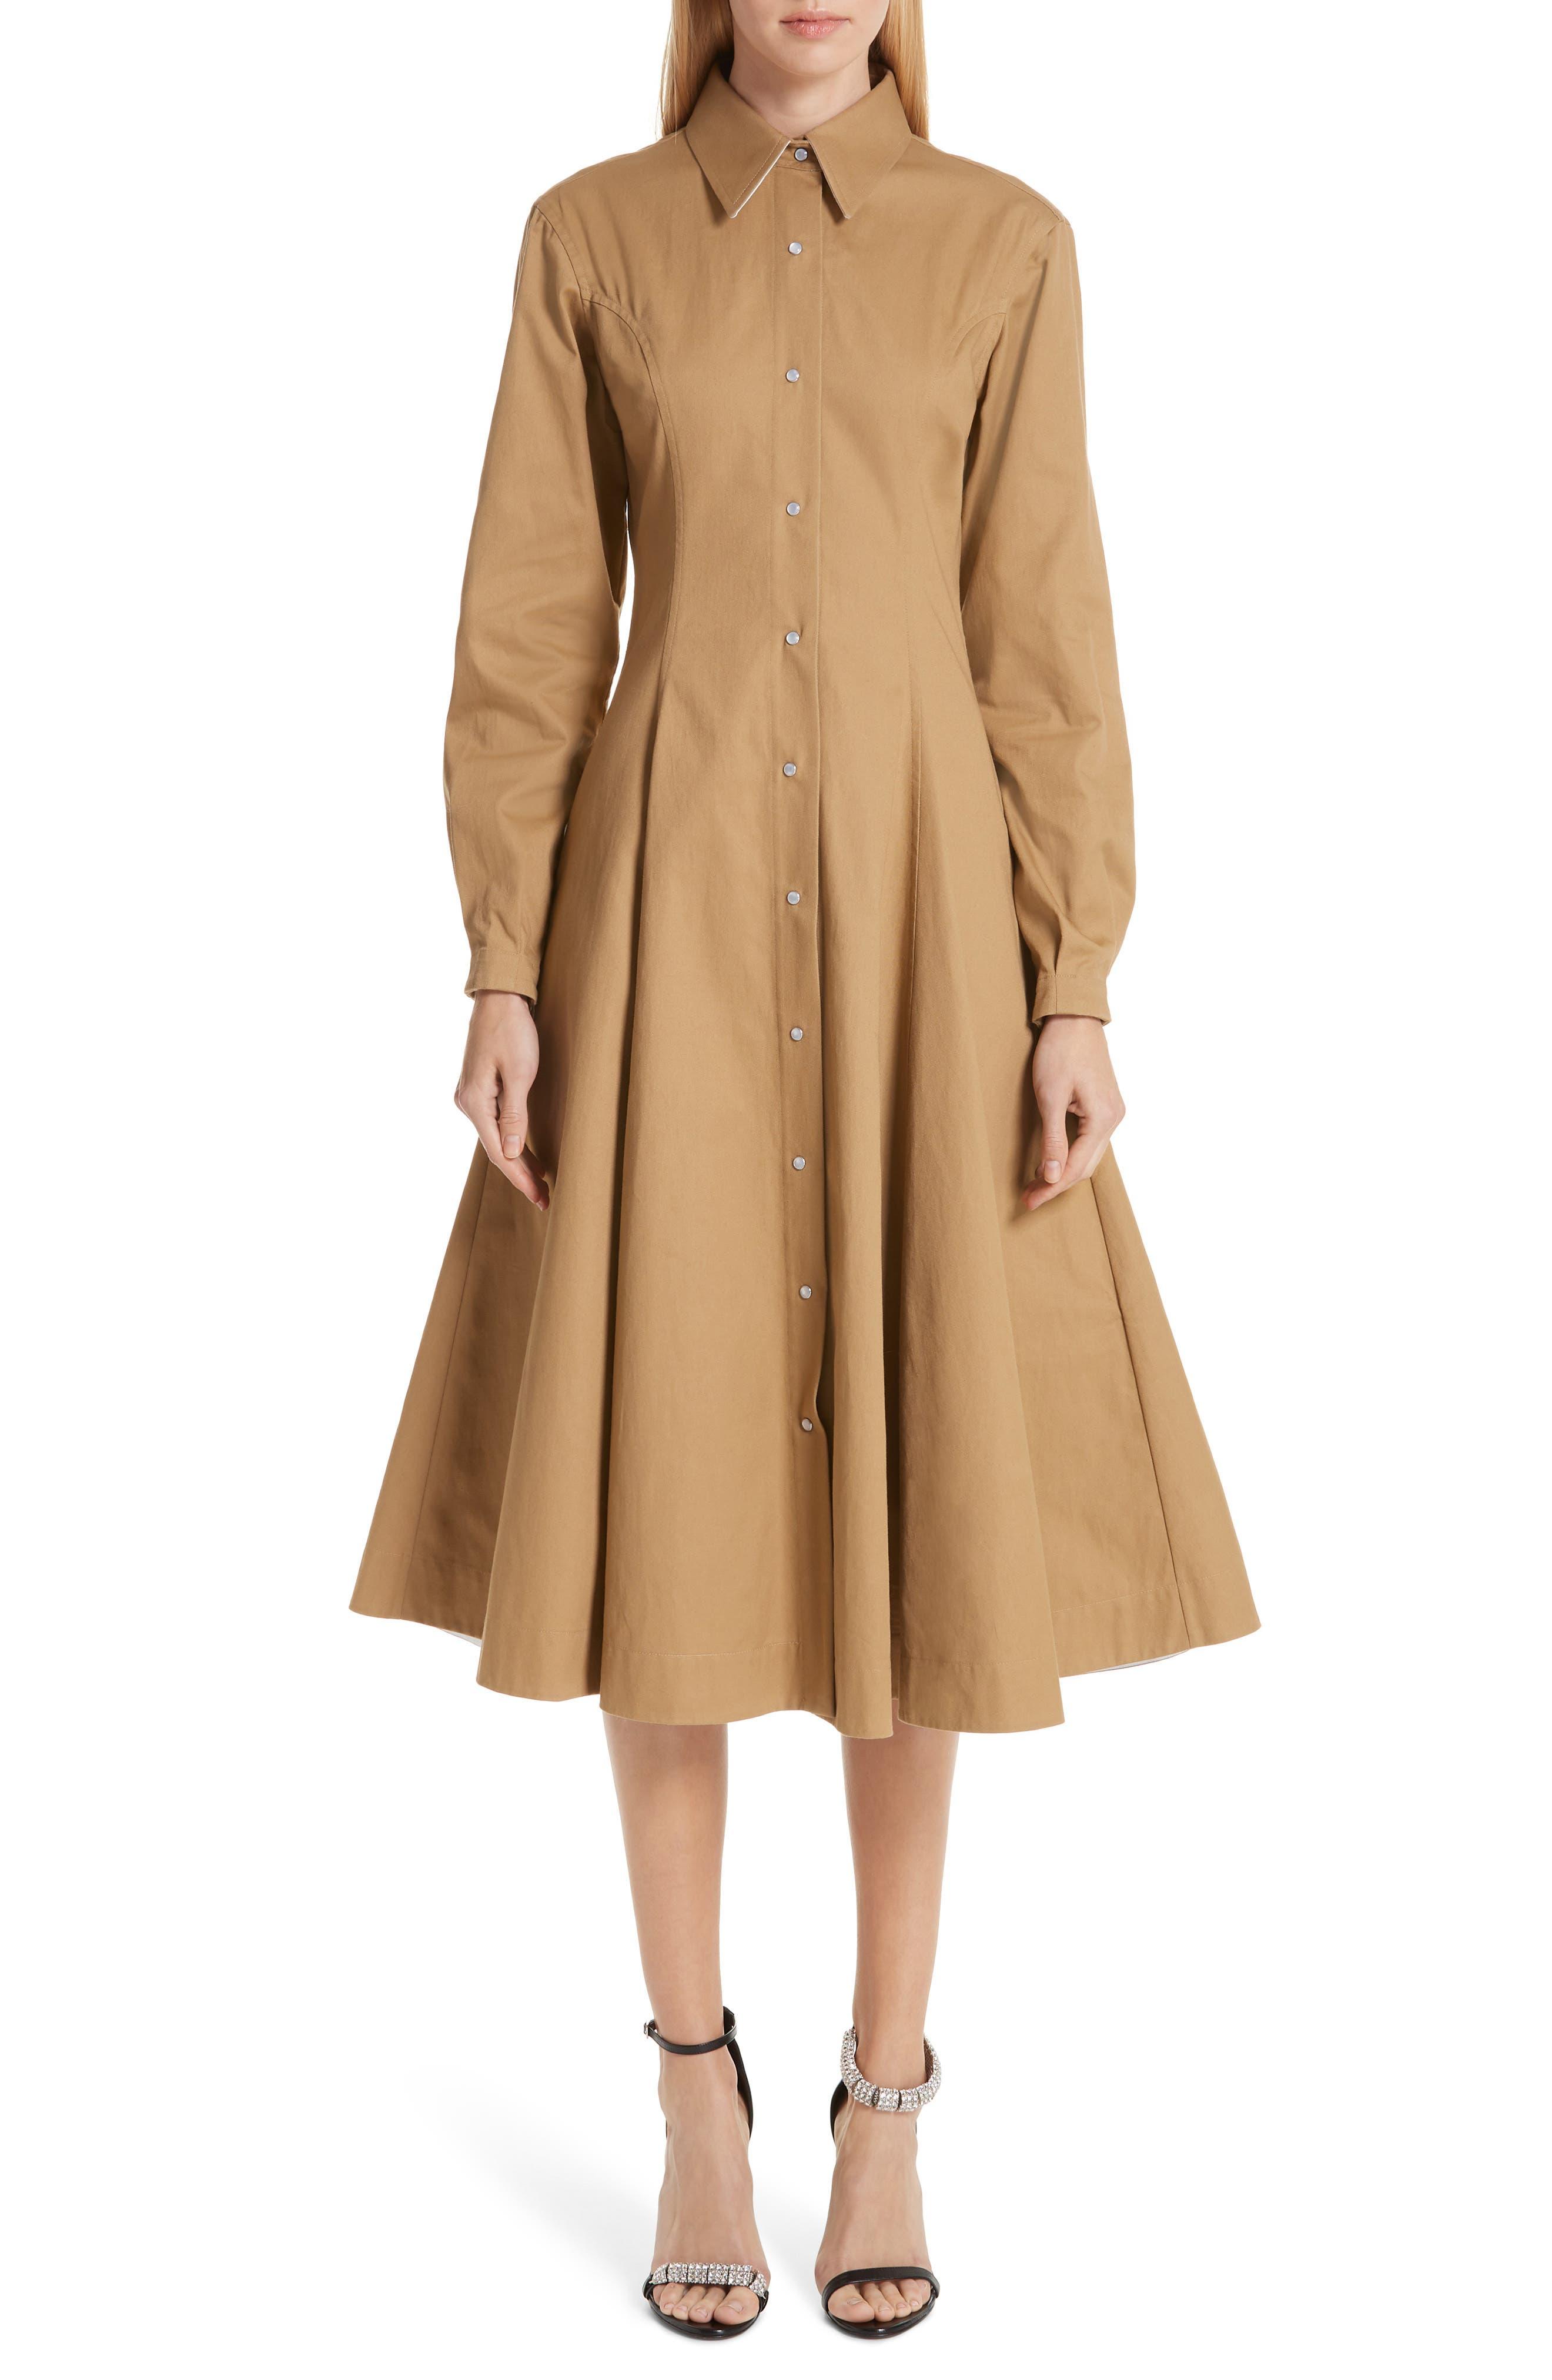 CALVIN KLEIN 205W39NYC, Western Twill A-Line Midi Dress, Main thumbnail 1, color, DUNE